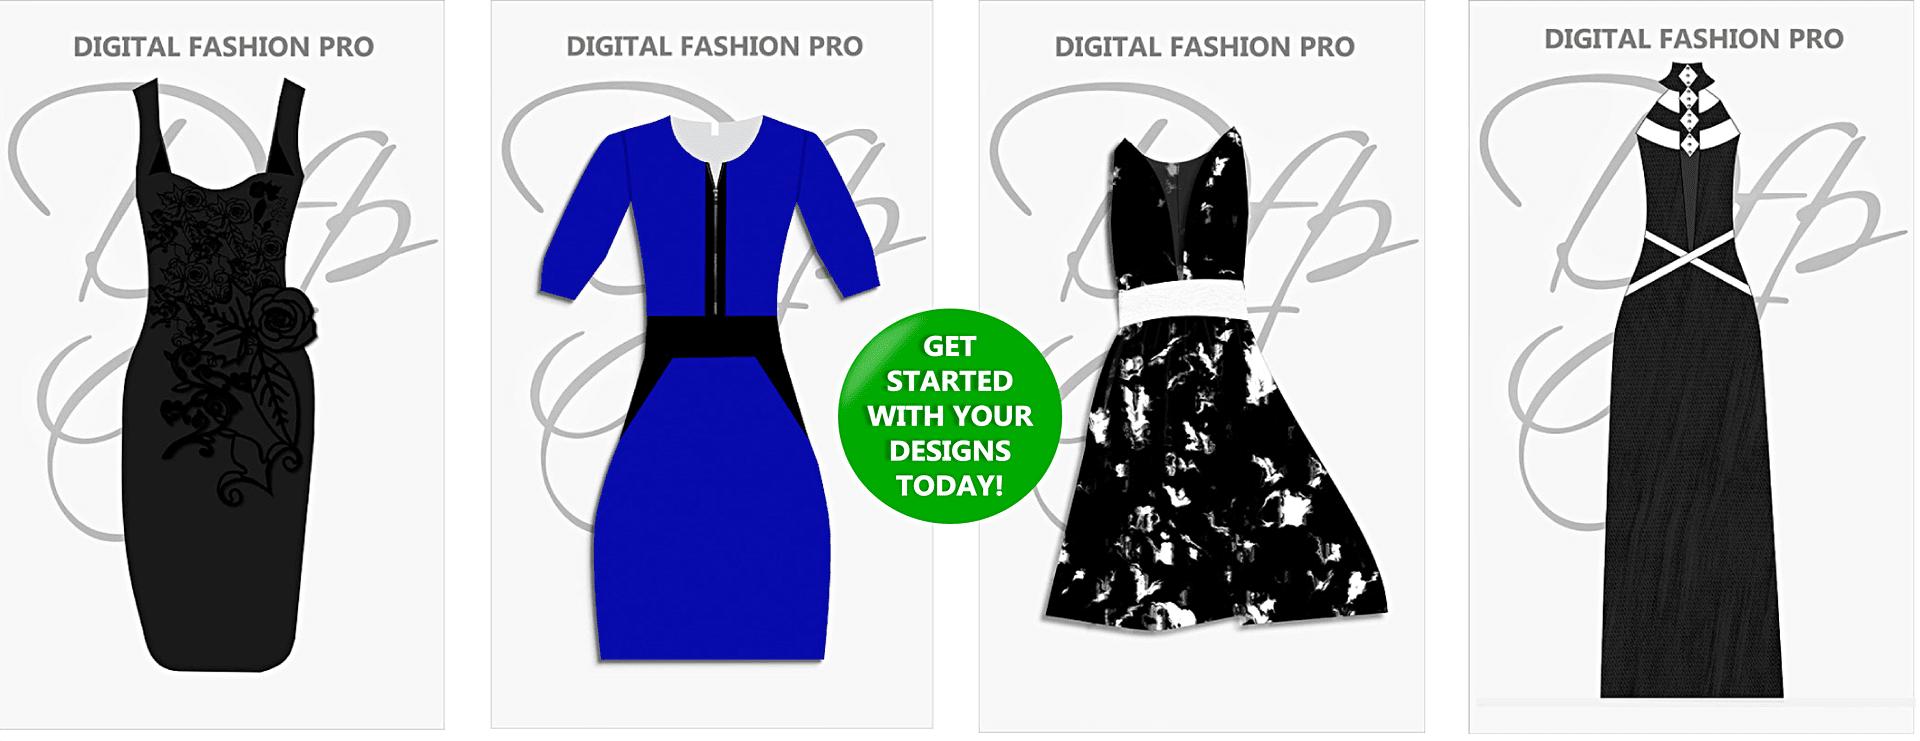 Fashion Design Software - Design Clothing - Start a clothing line - Digital Fashion Pro